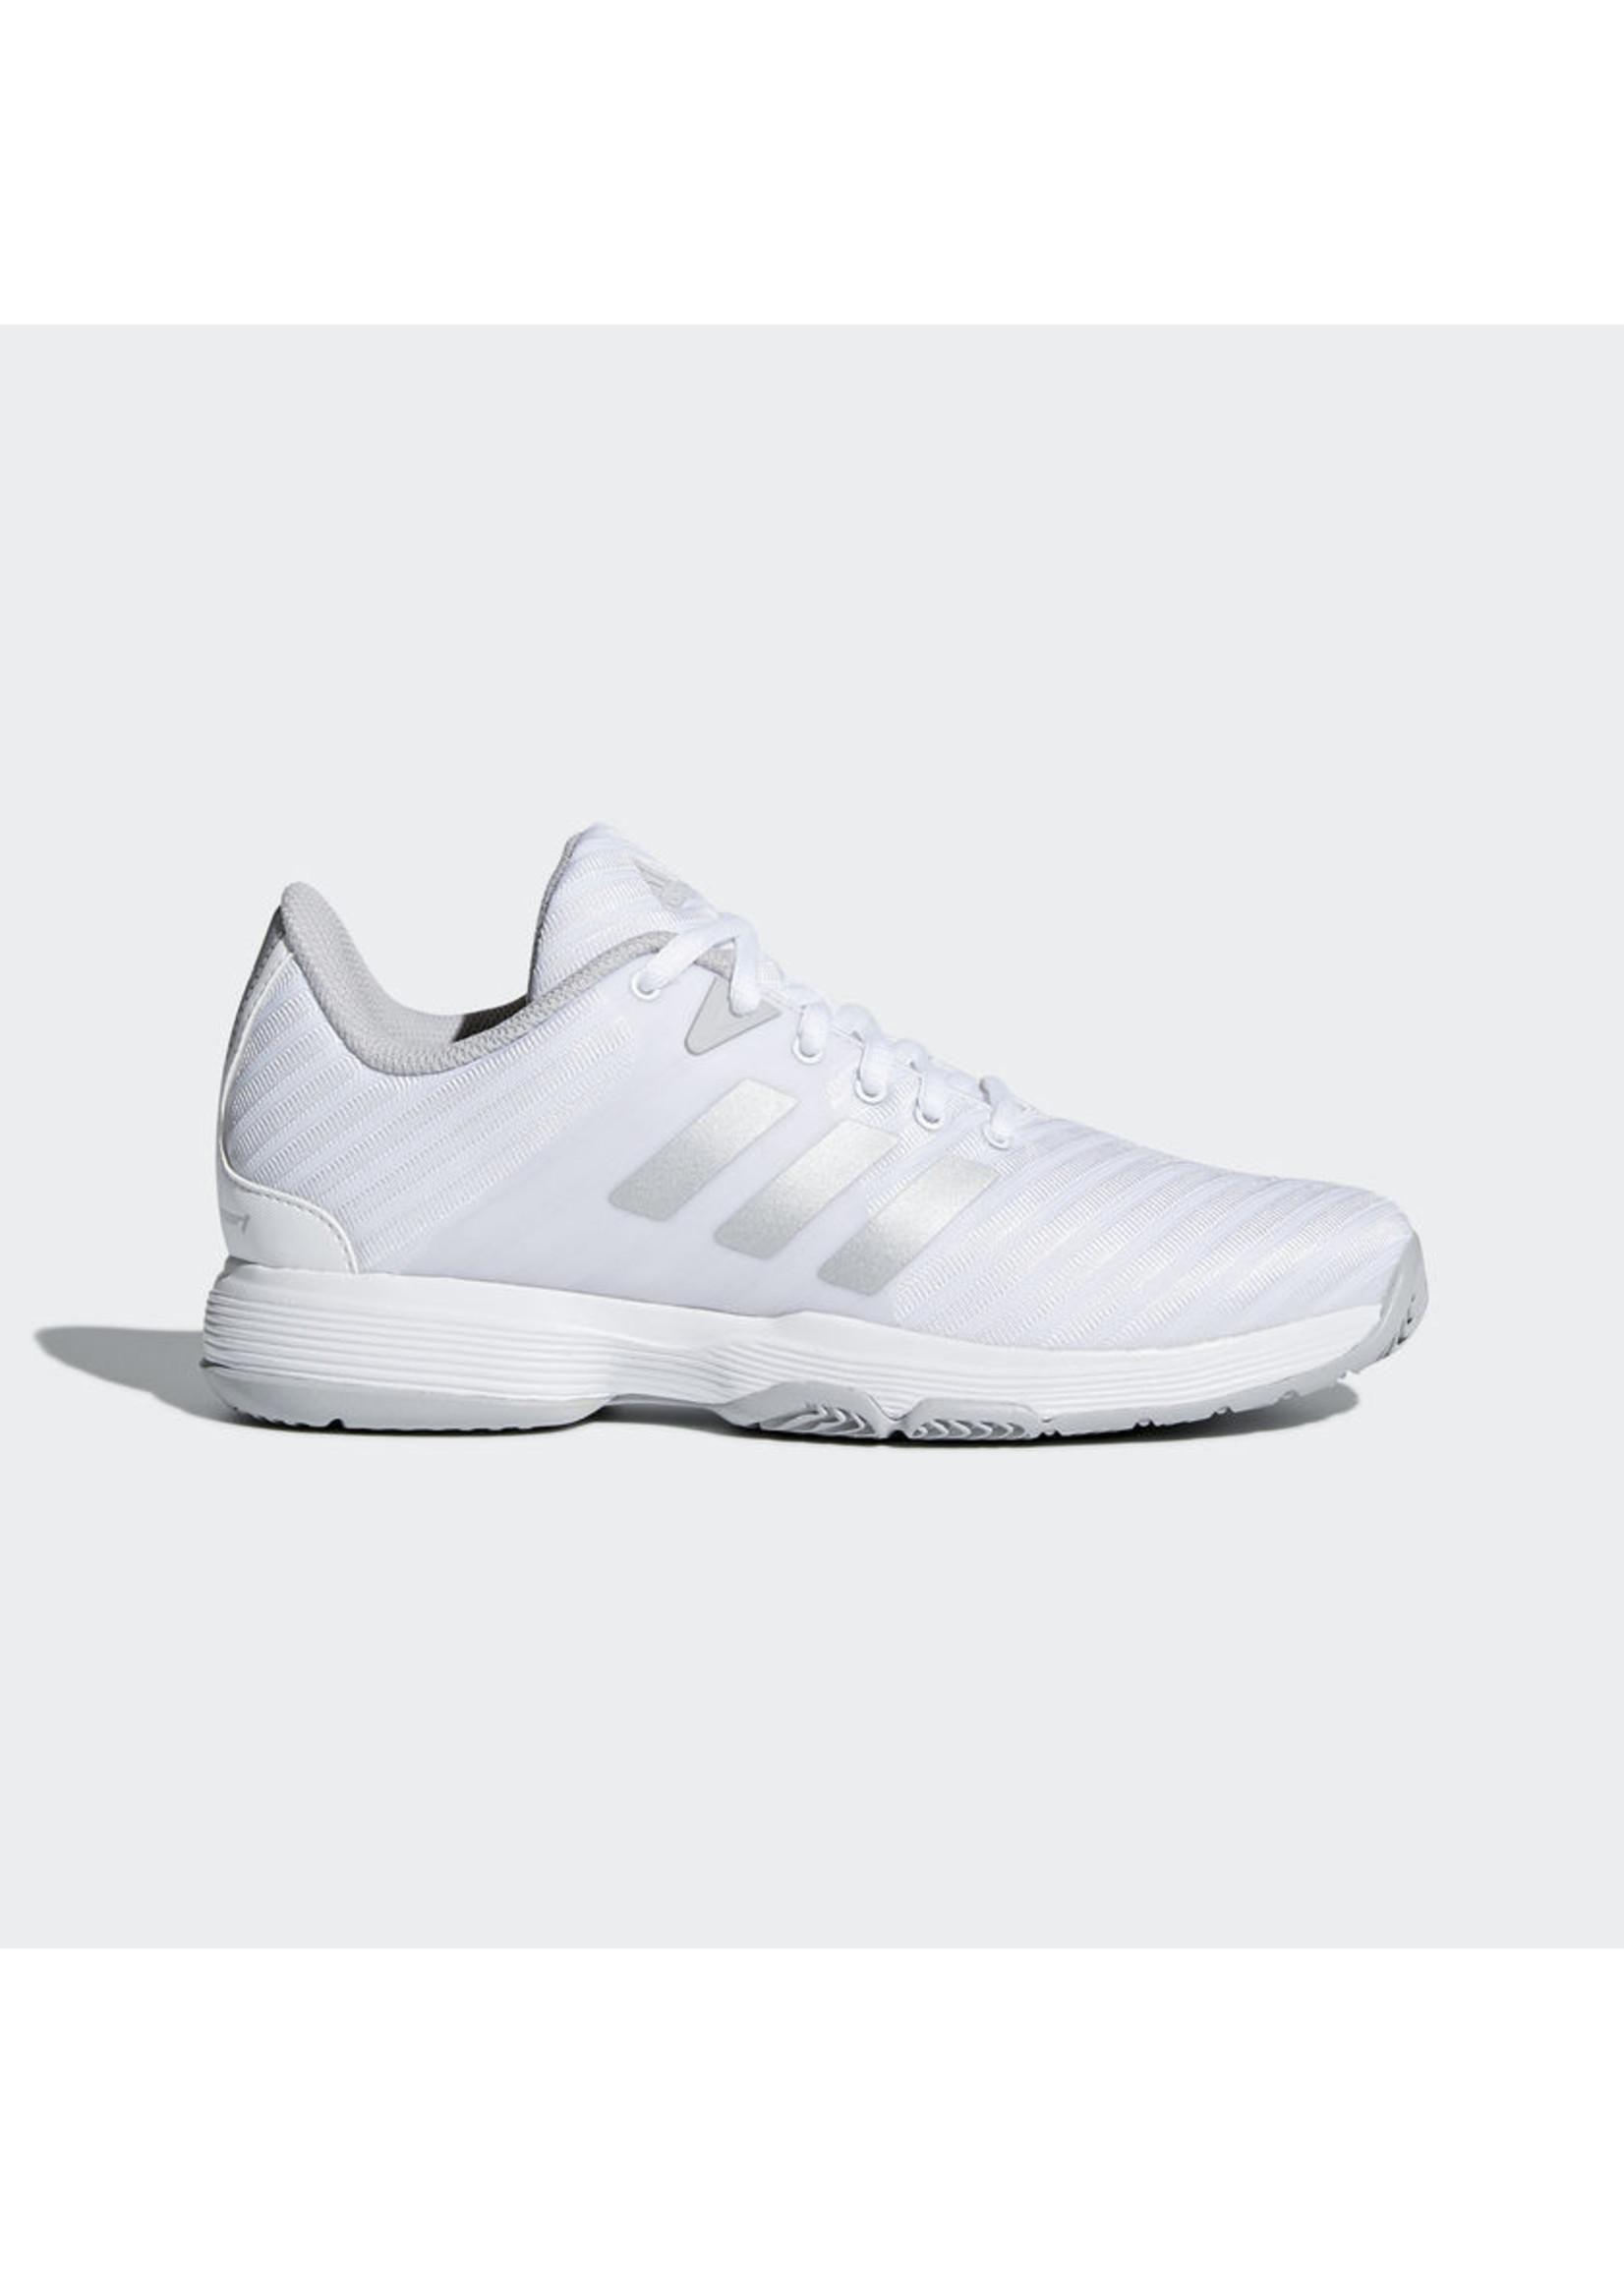 Adidas Adidas Barricade Court Womens Tennis Shoe (2018)